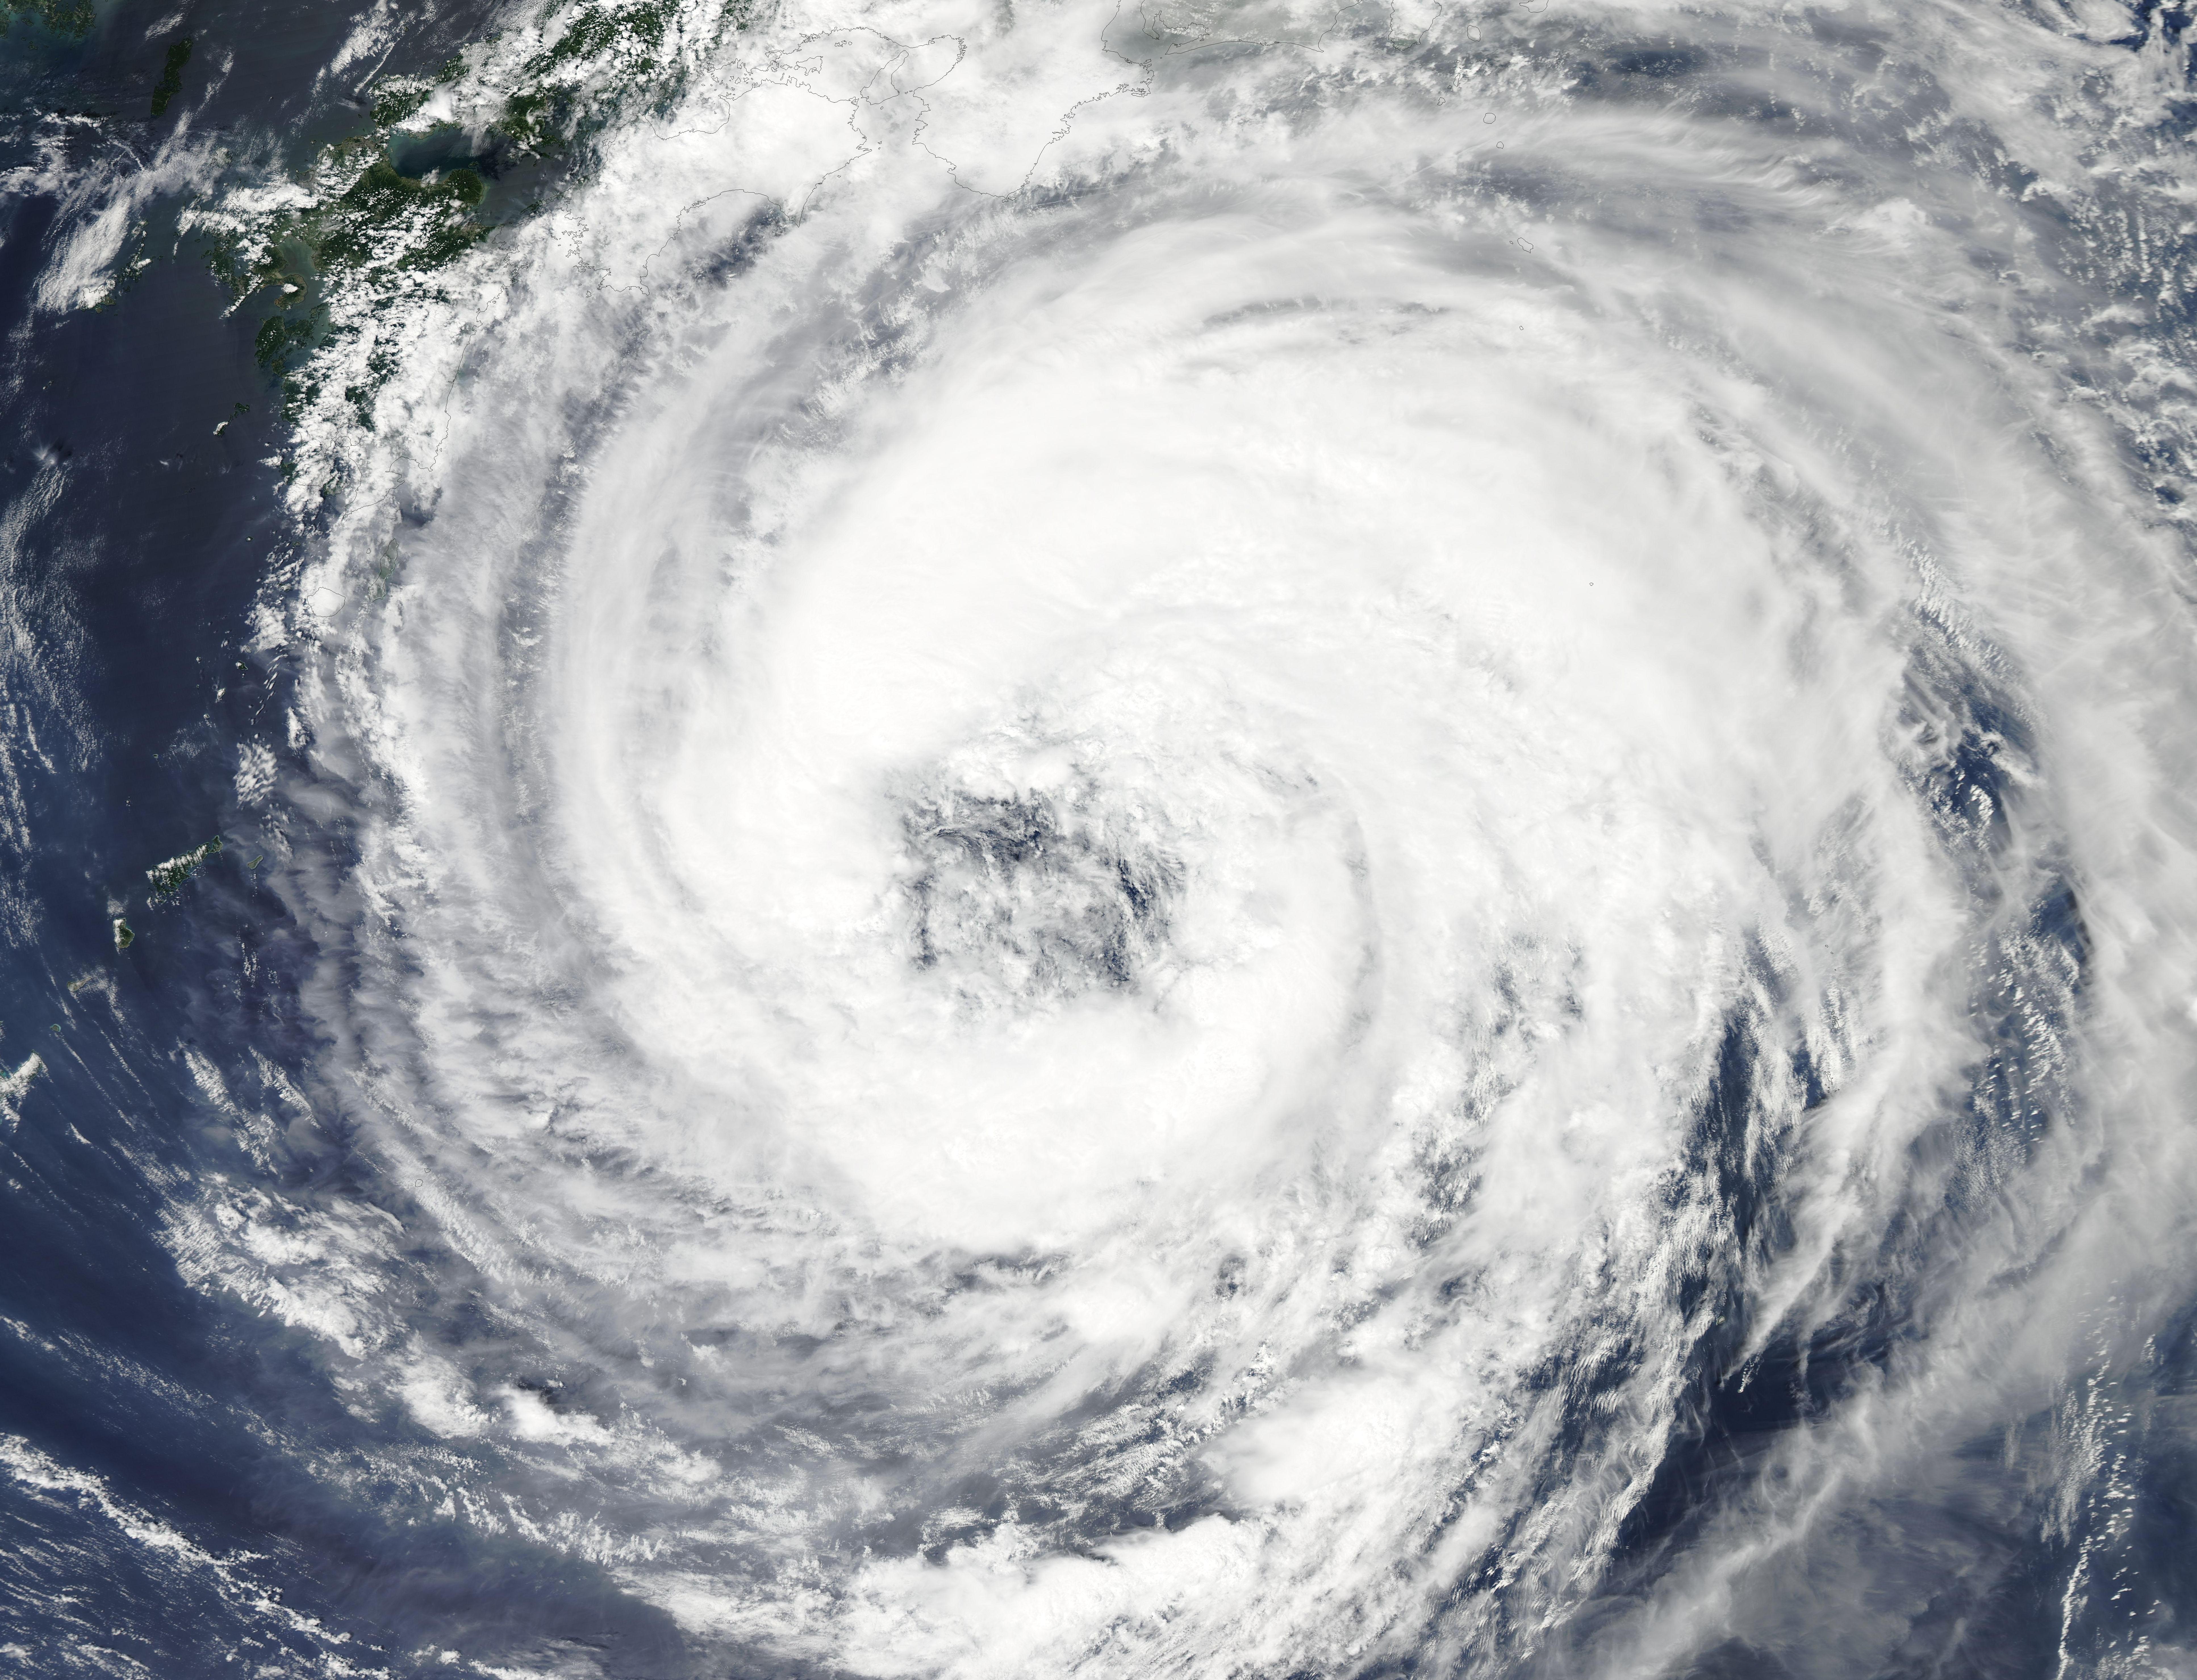 NASA - Hurricane Season 2011: Tropical Storm Talas ...